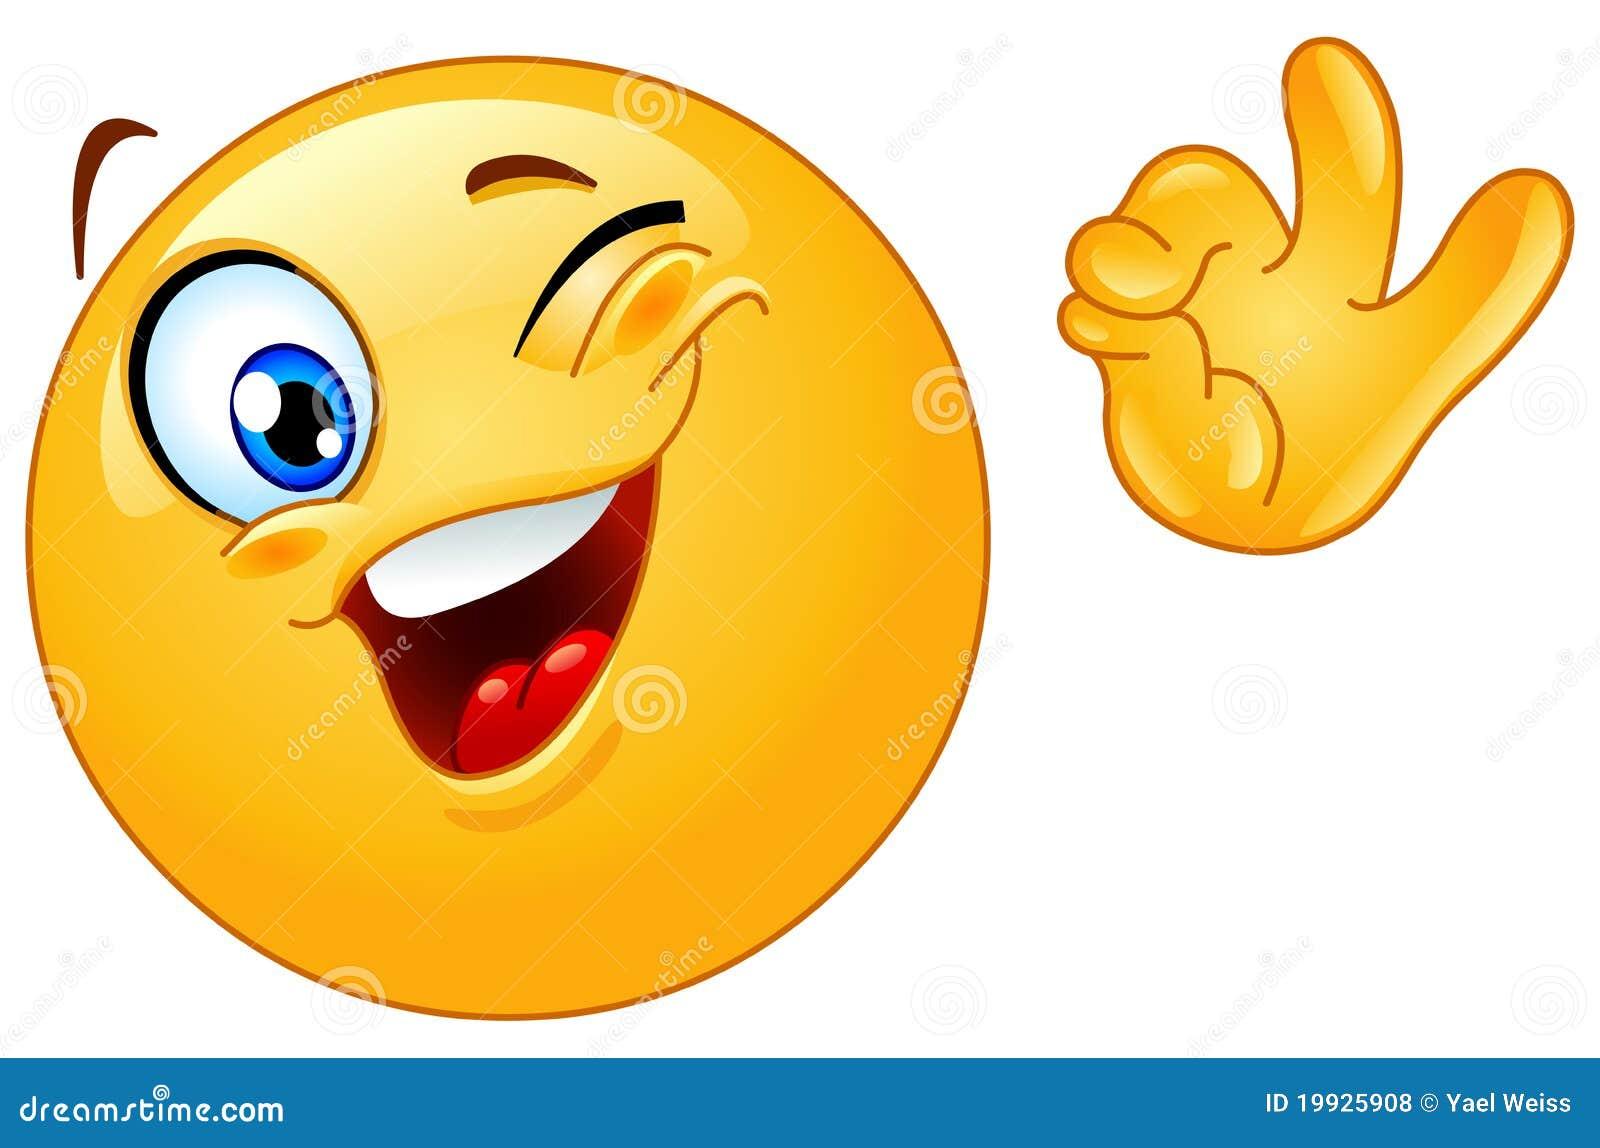 Winking emoticon stock vector  Illustration of happy - 19925908